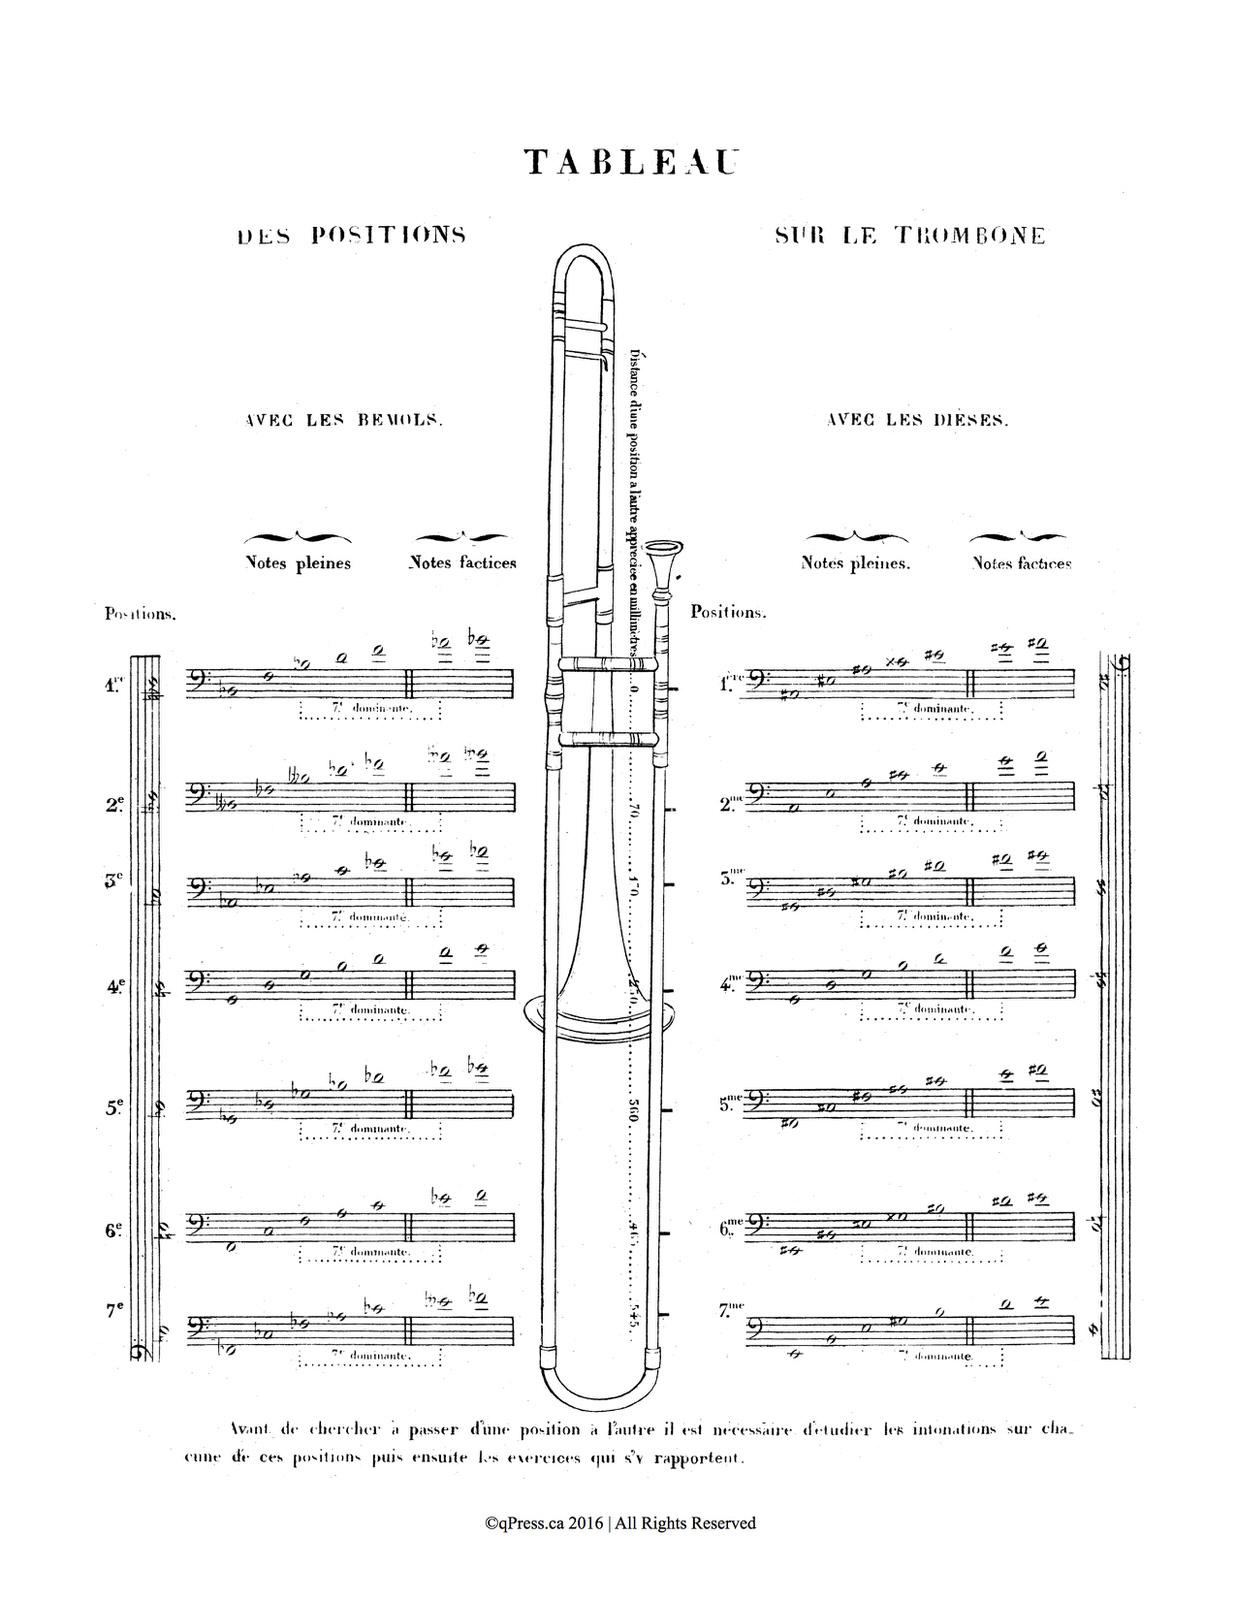 Berr & Dieppo, Methode Complete de Trombone a Coulisse 2